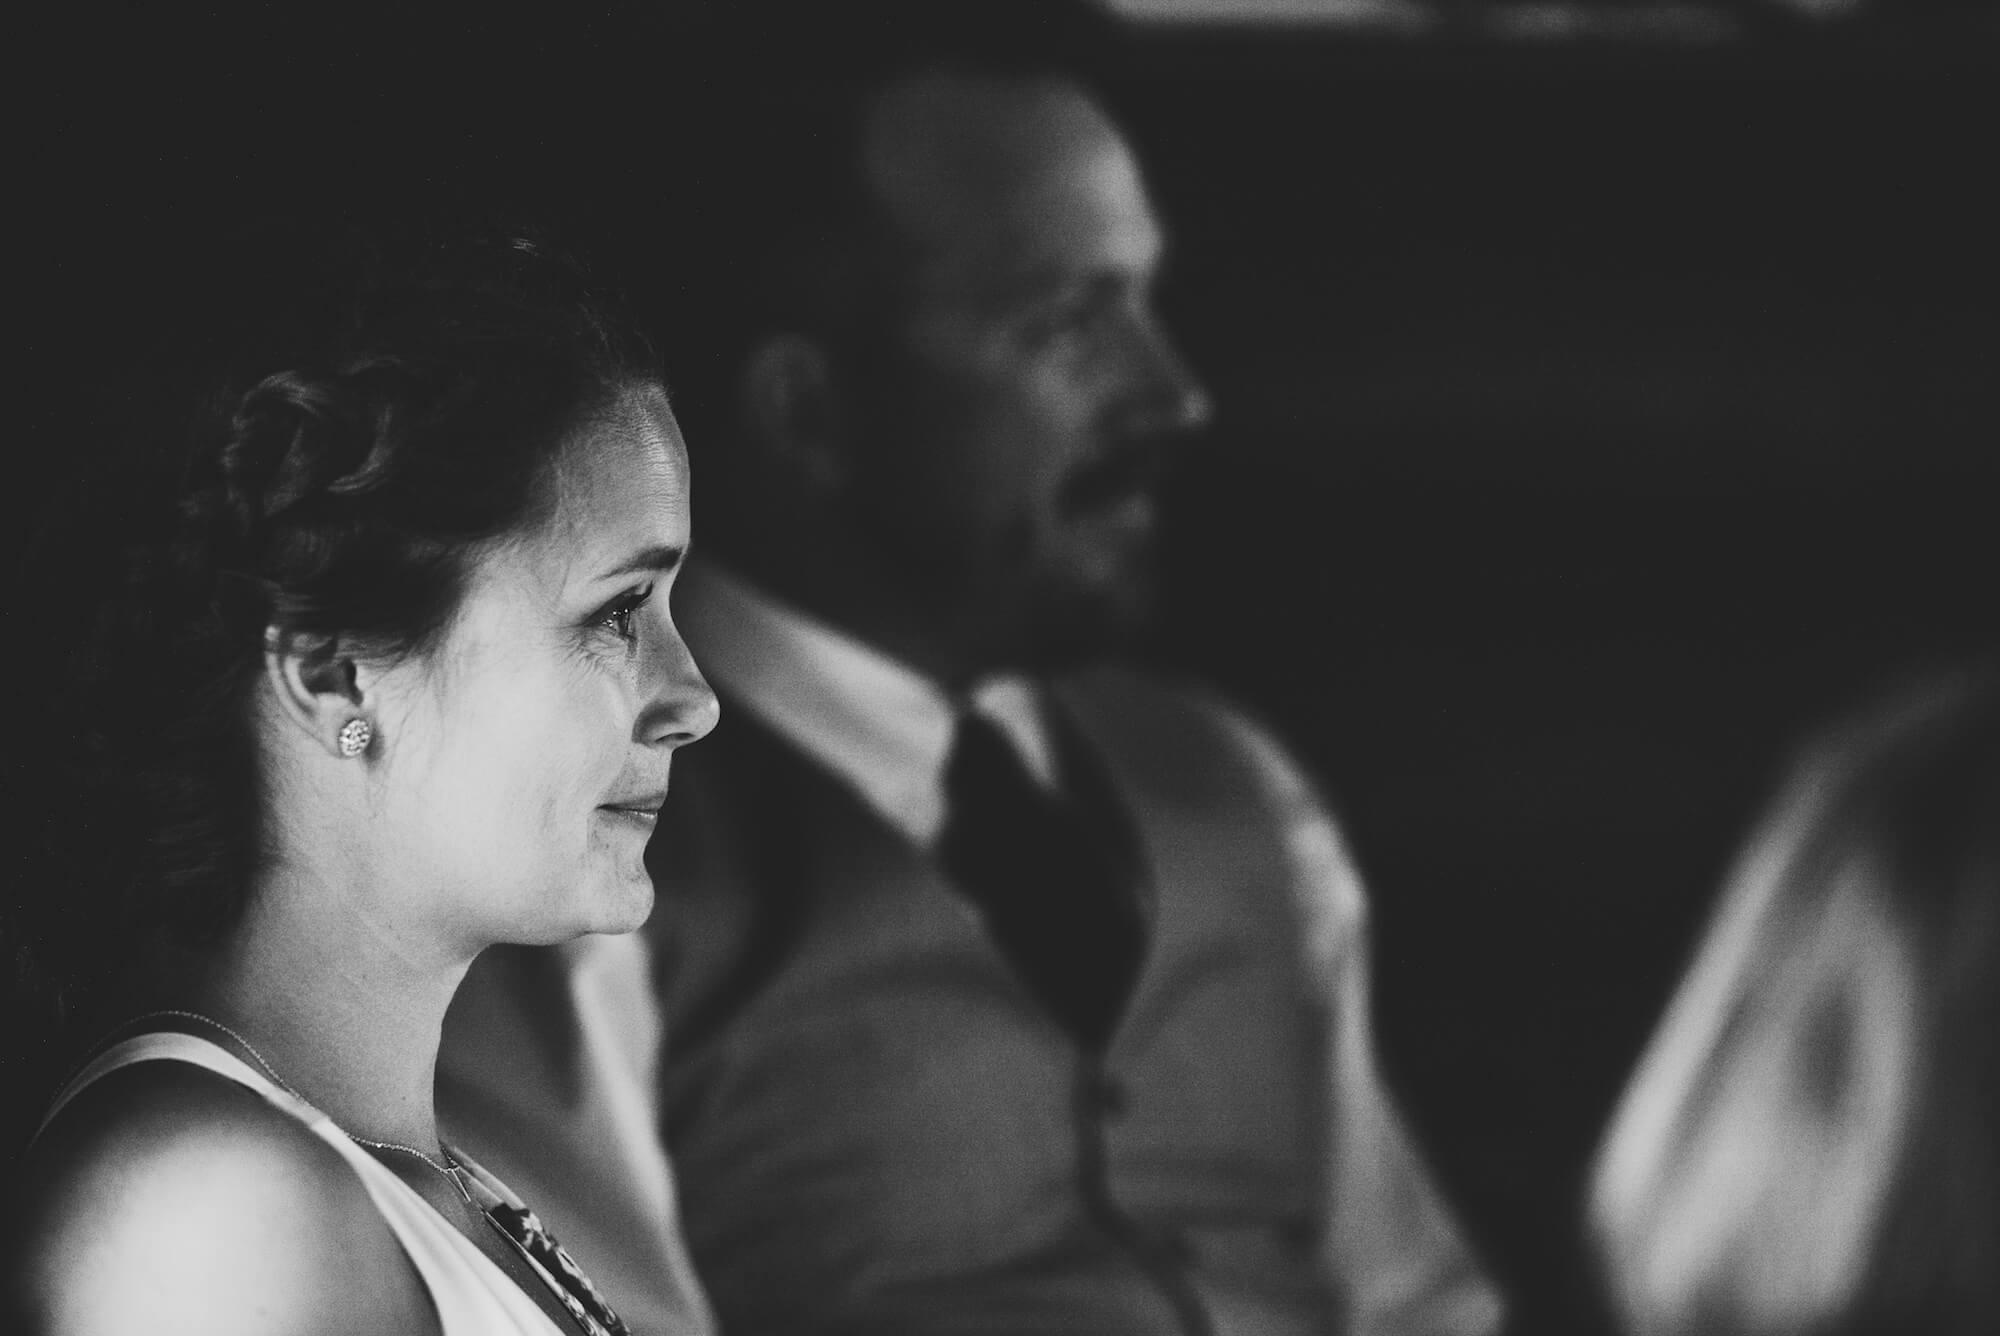 engle-olson-maddy-pat-mn-wedding-photography-33.jpg